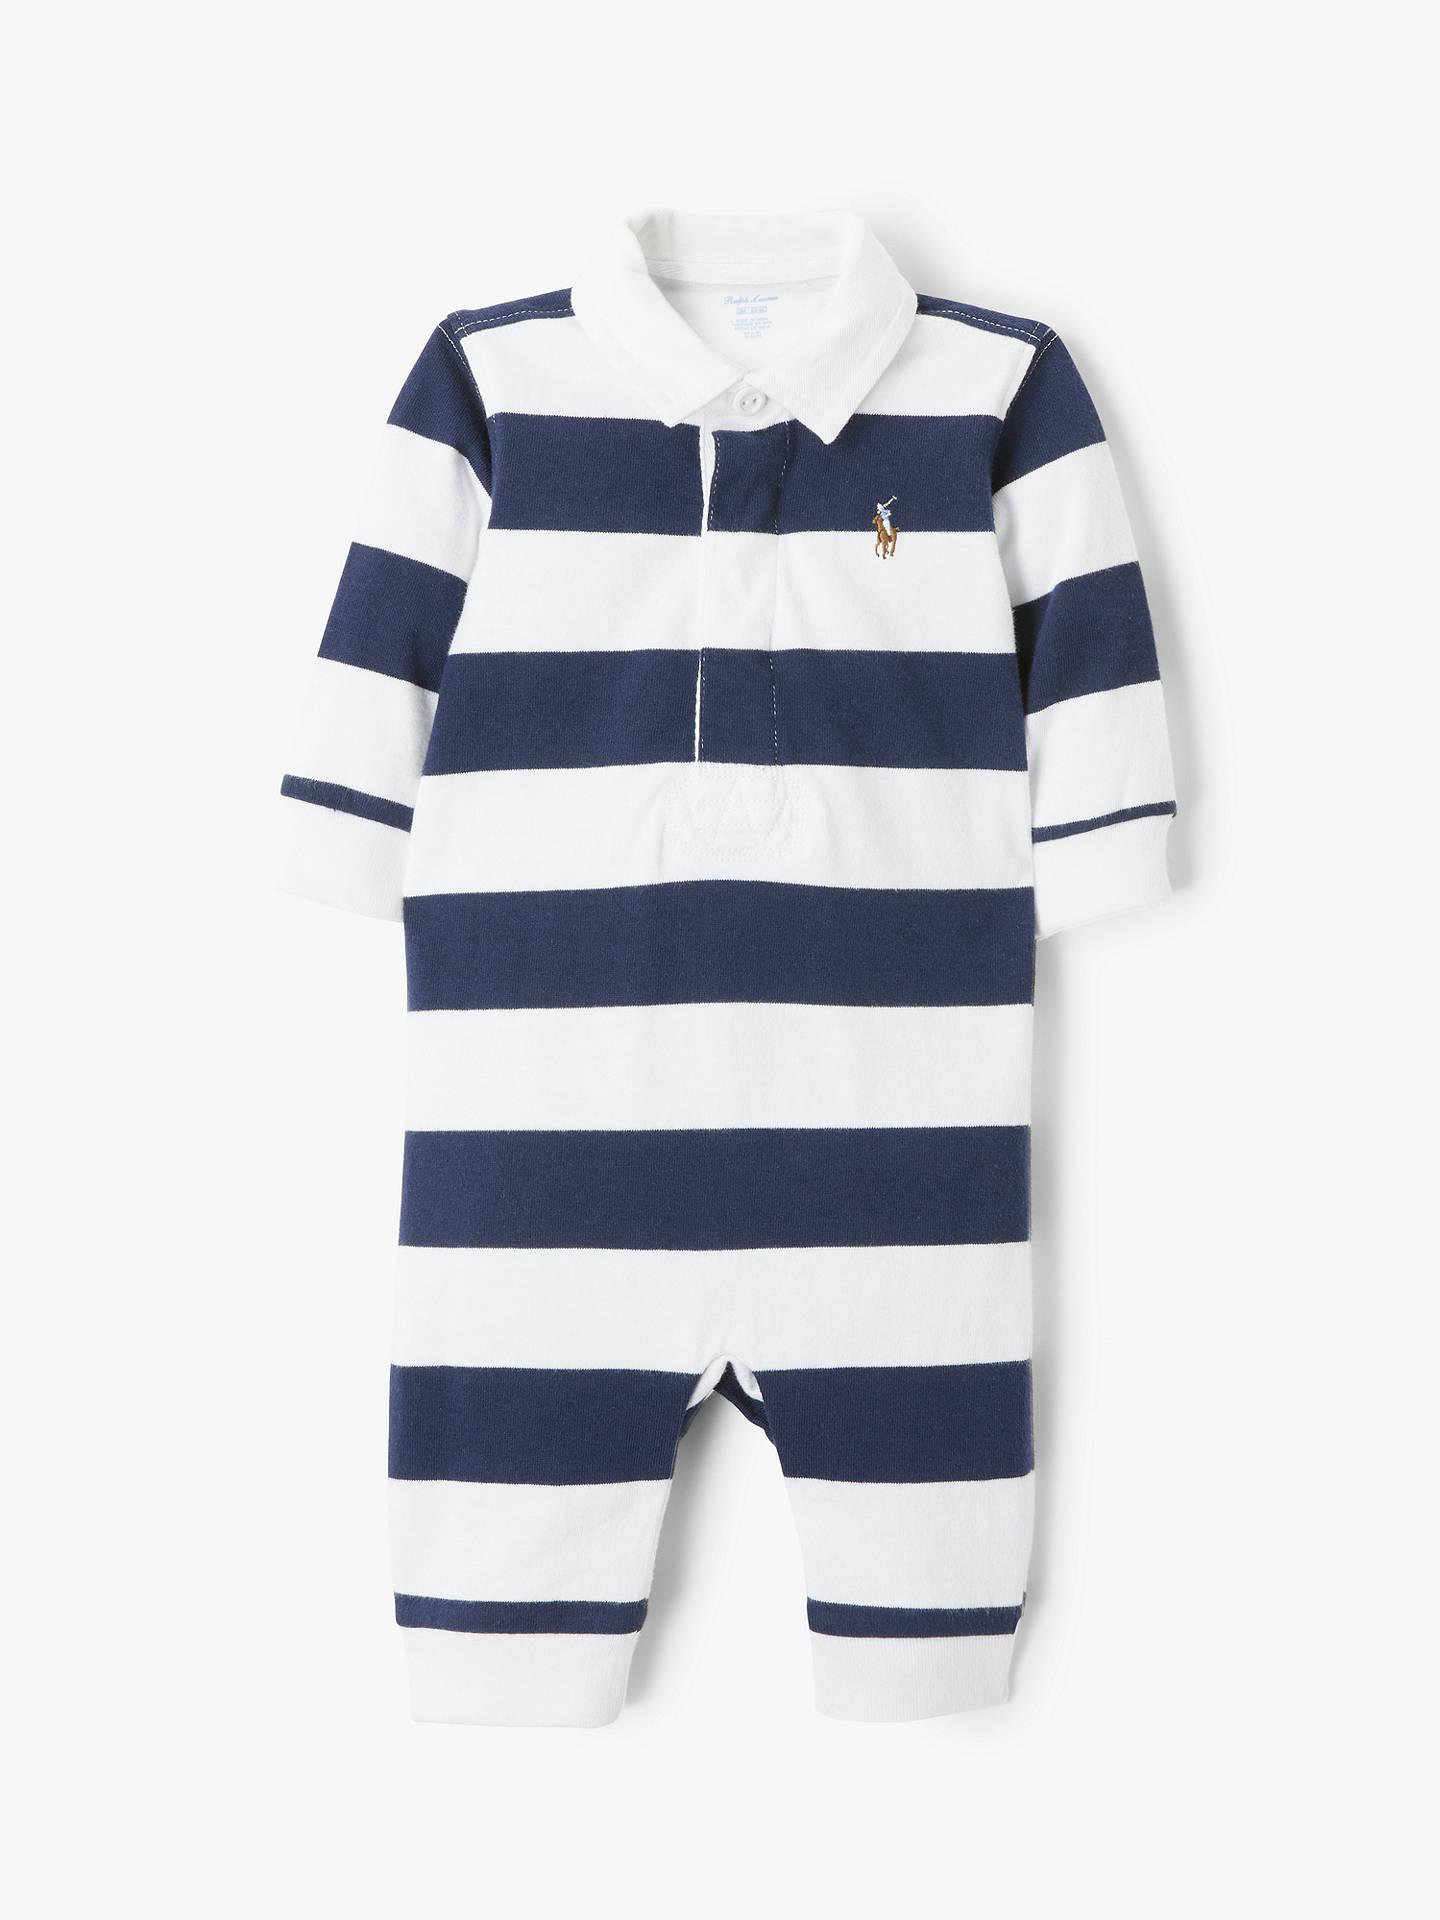 e033f477fd Polo Ralph Lauren Baby Rugby Bodysuit, Navy/White